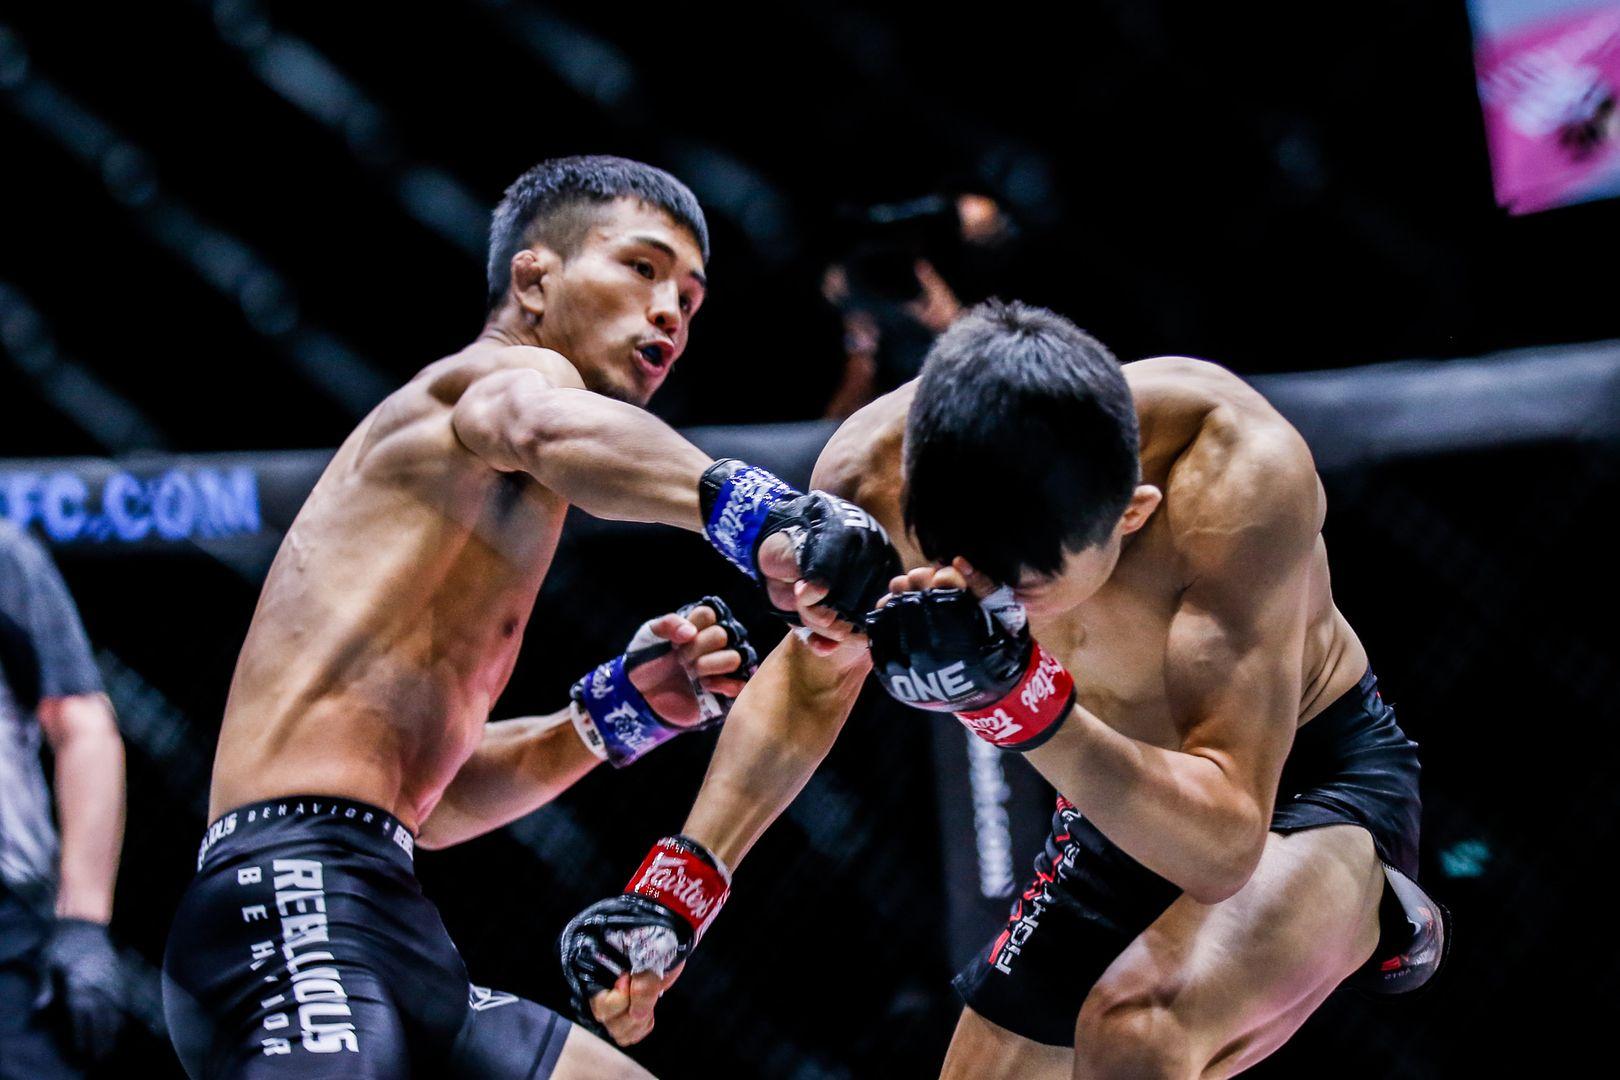 Japanese MMA star Yuya Wakamatsu fights South Korean phenom Kim Kyu Sung at ONE: INSIDE THE MATRIX II in Singapore